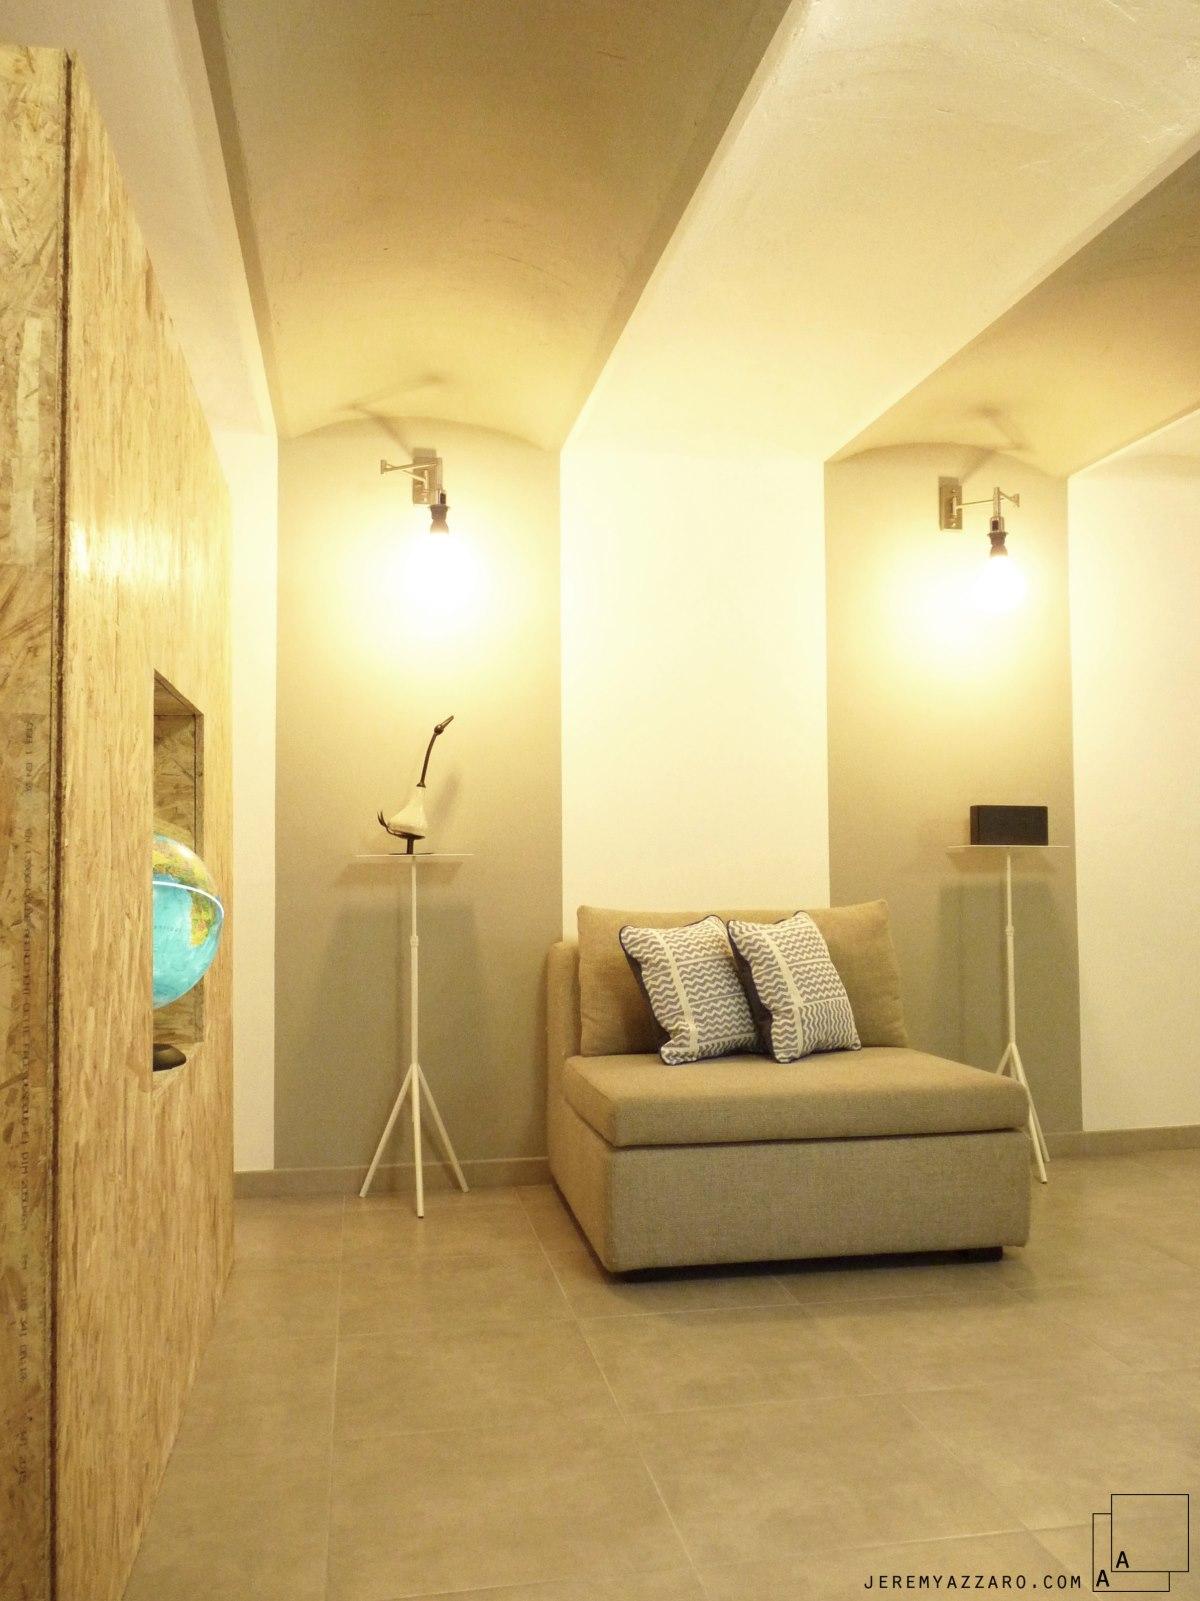 renovation-loft-cave-marseille-voutes-salon-meuble-osb-jeremy-azzaro-architecte